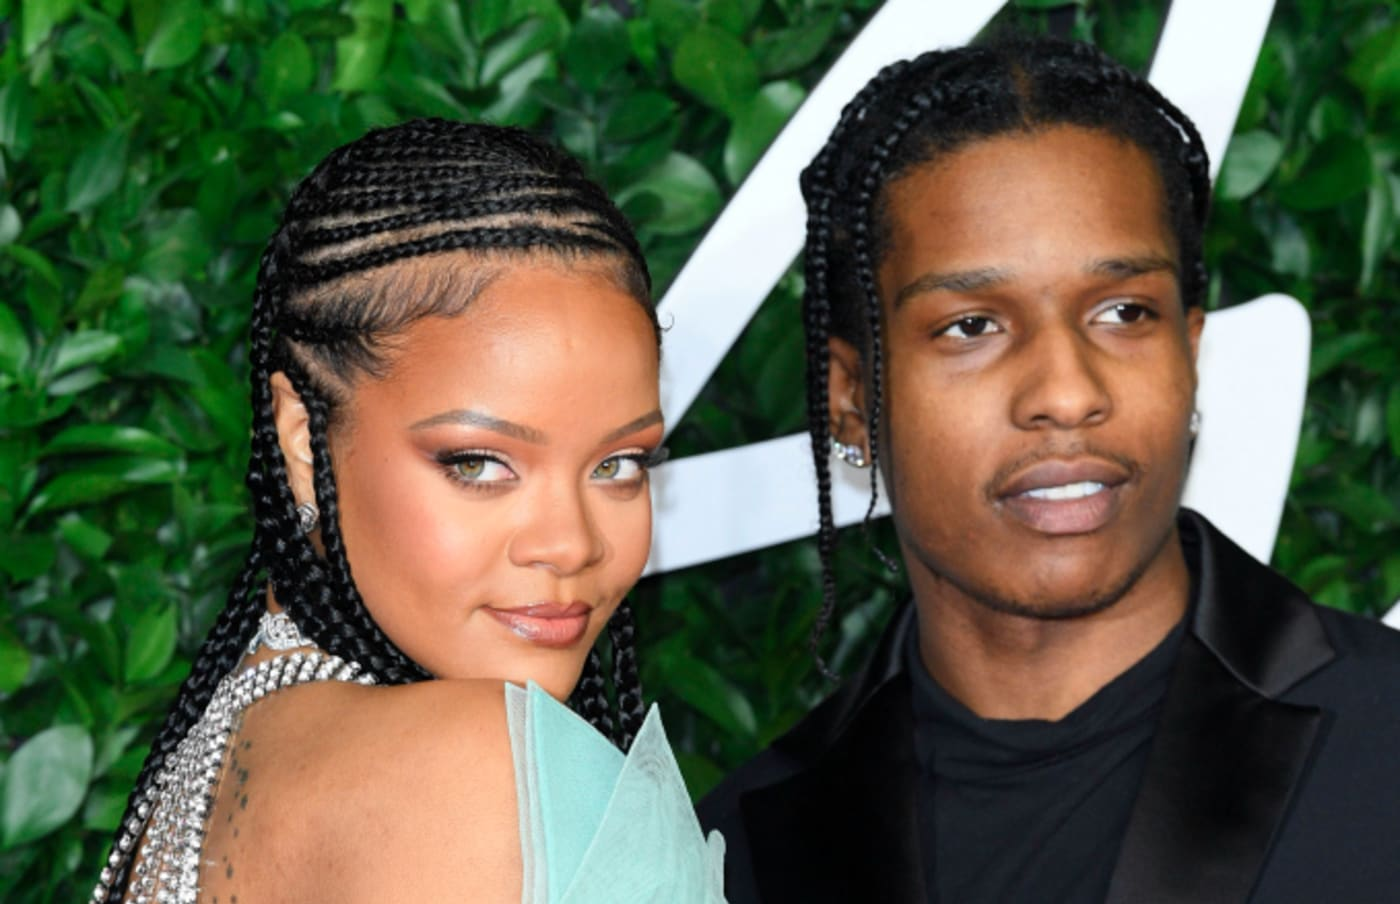 Rihanna and ASAP Rocky arrive at The Fashion Awards 2019